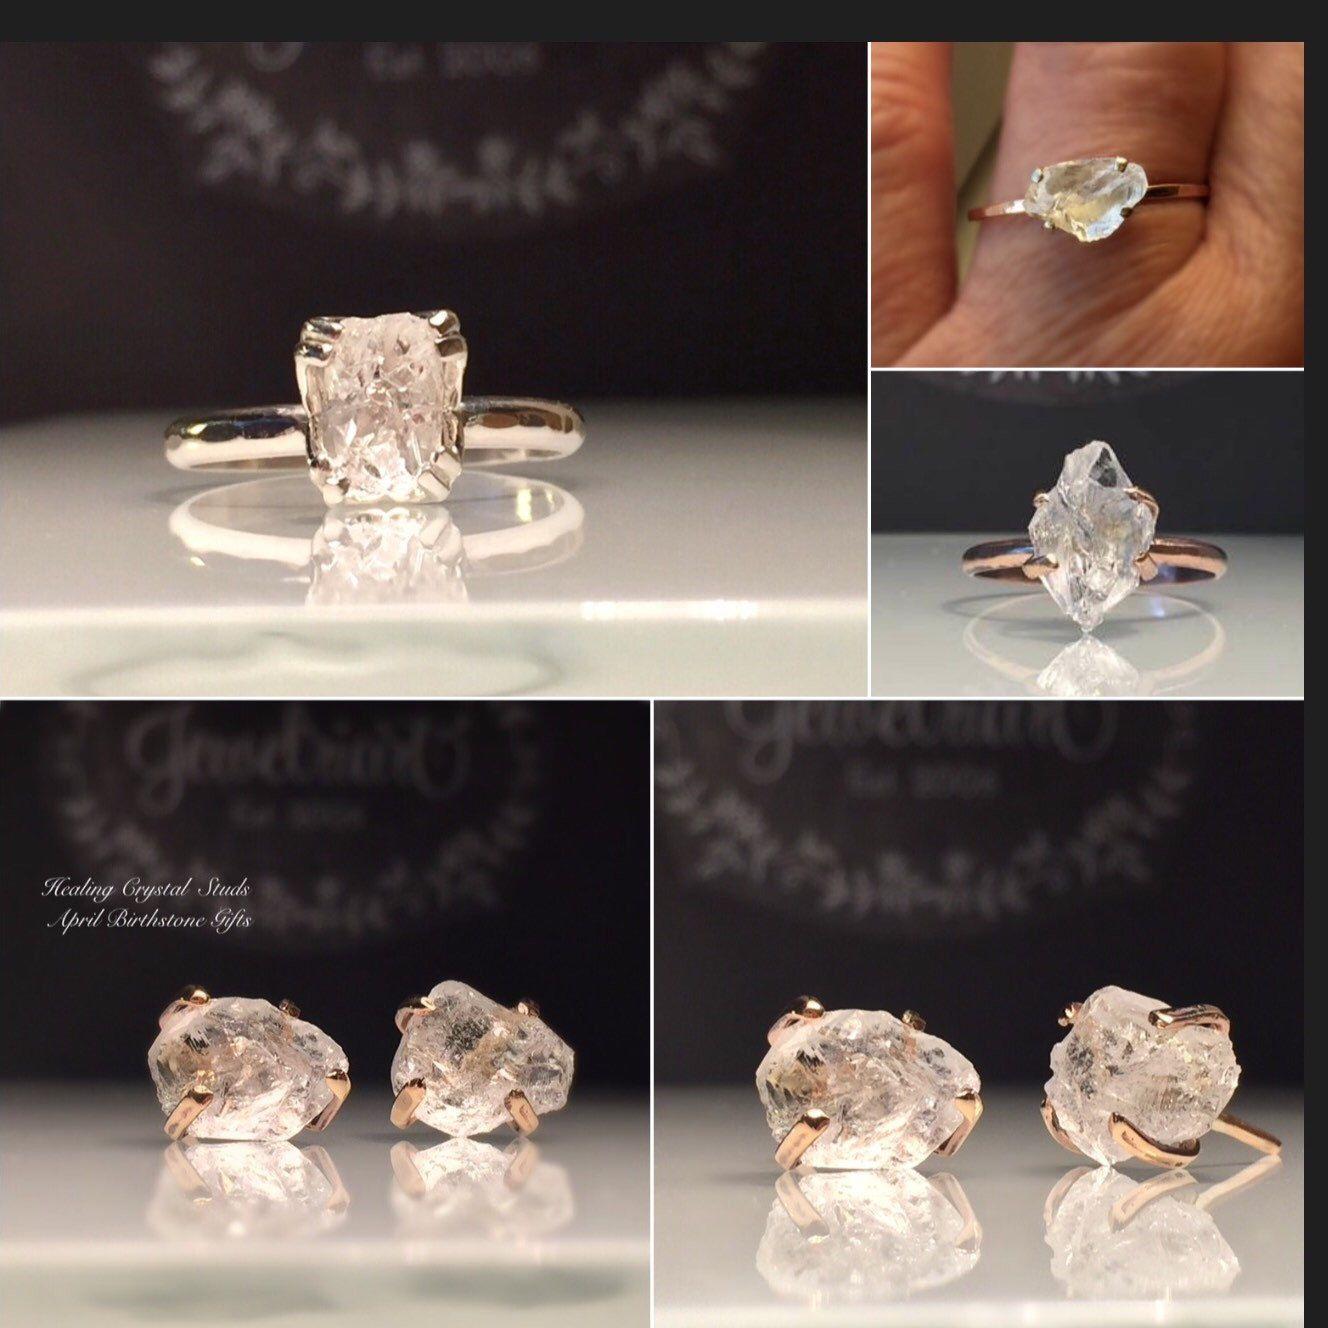 Healing Crystal EarringsHerkimer Diamond StudsRaw Rose Gold